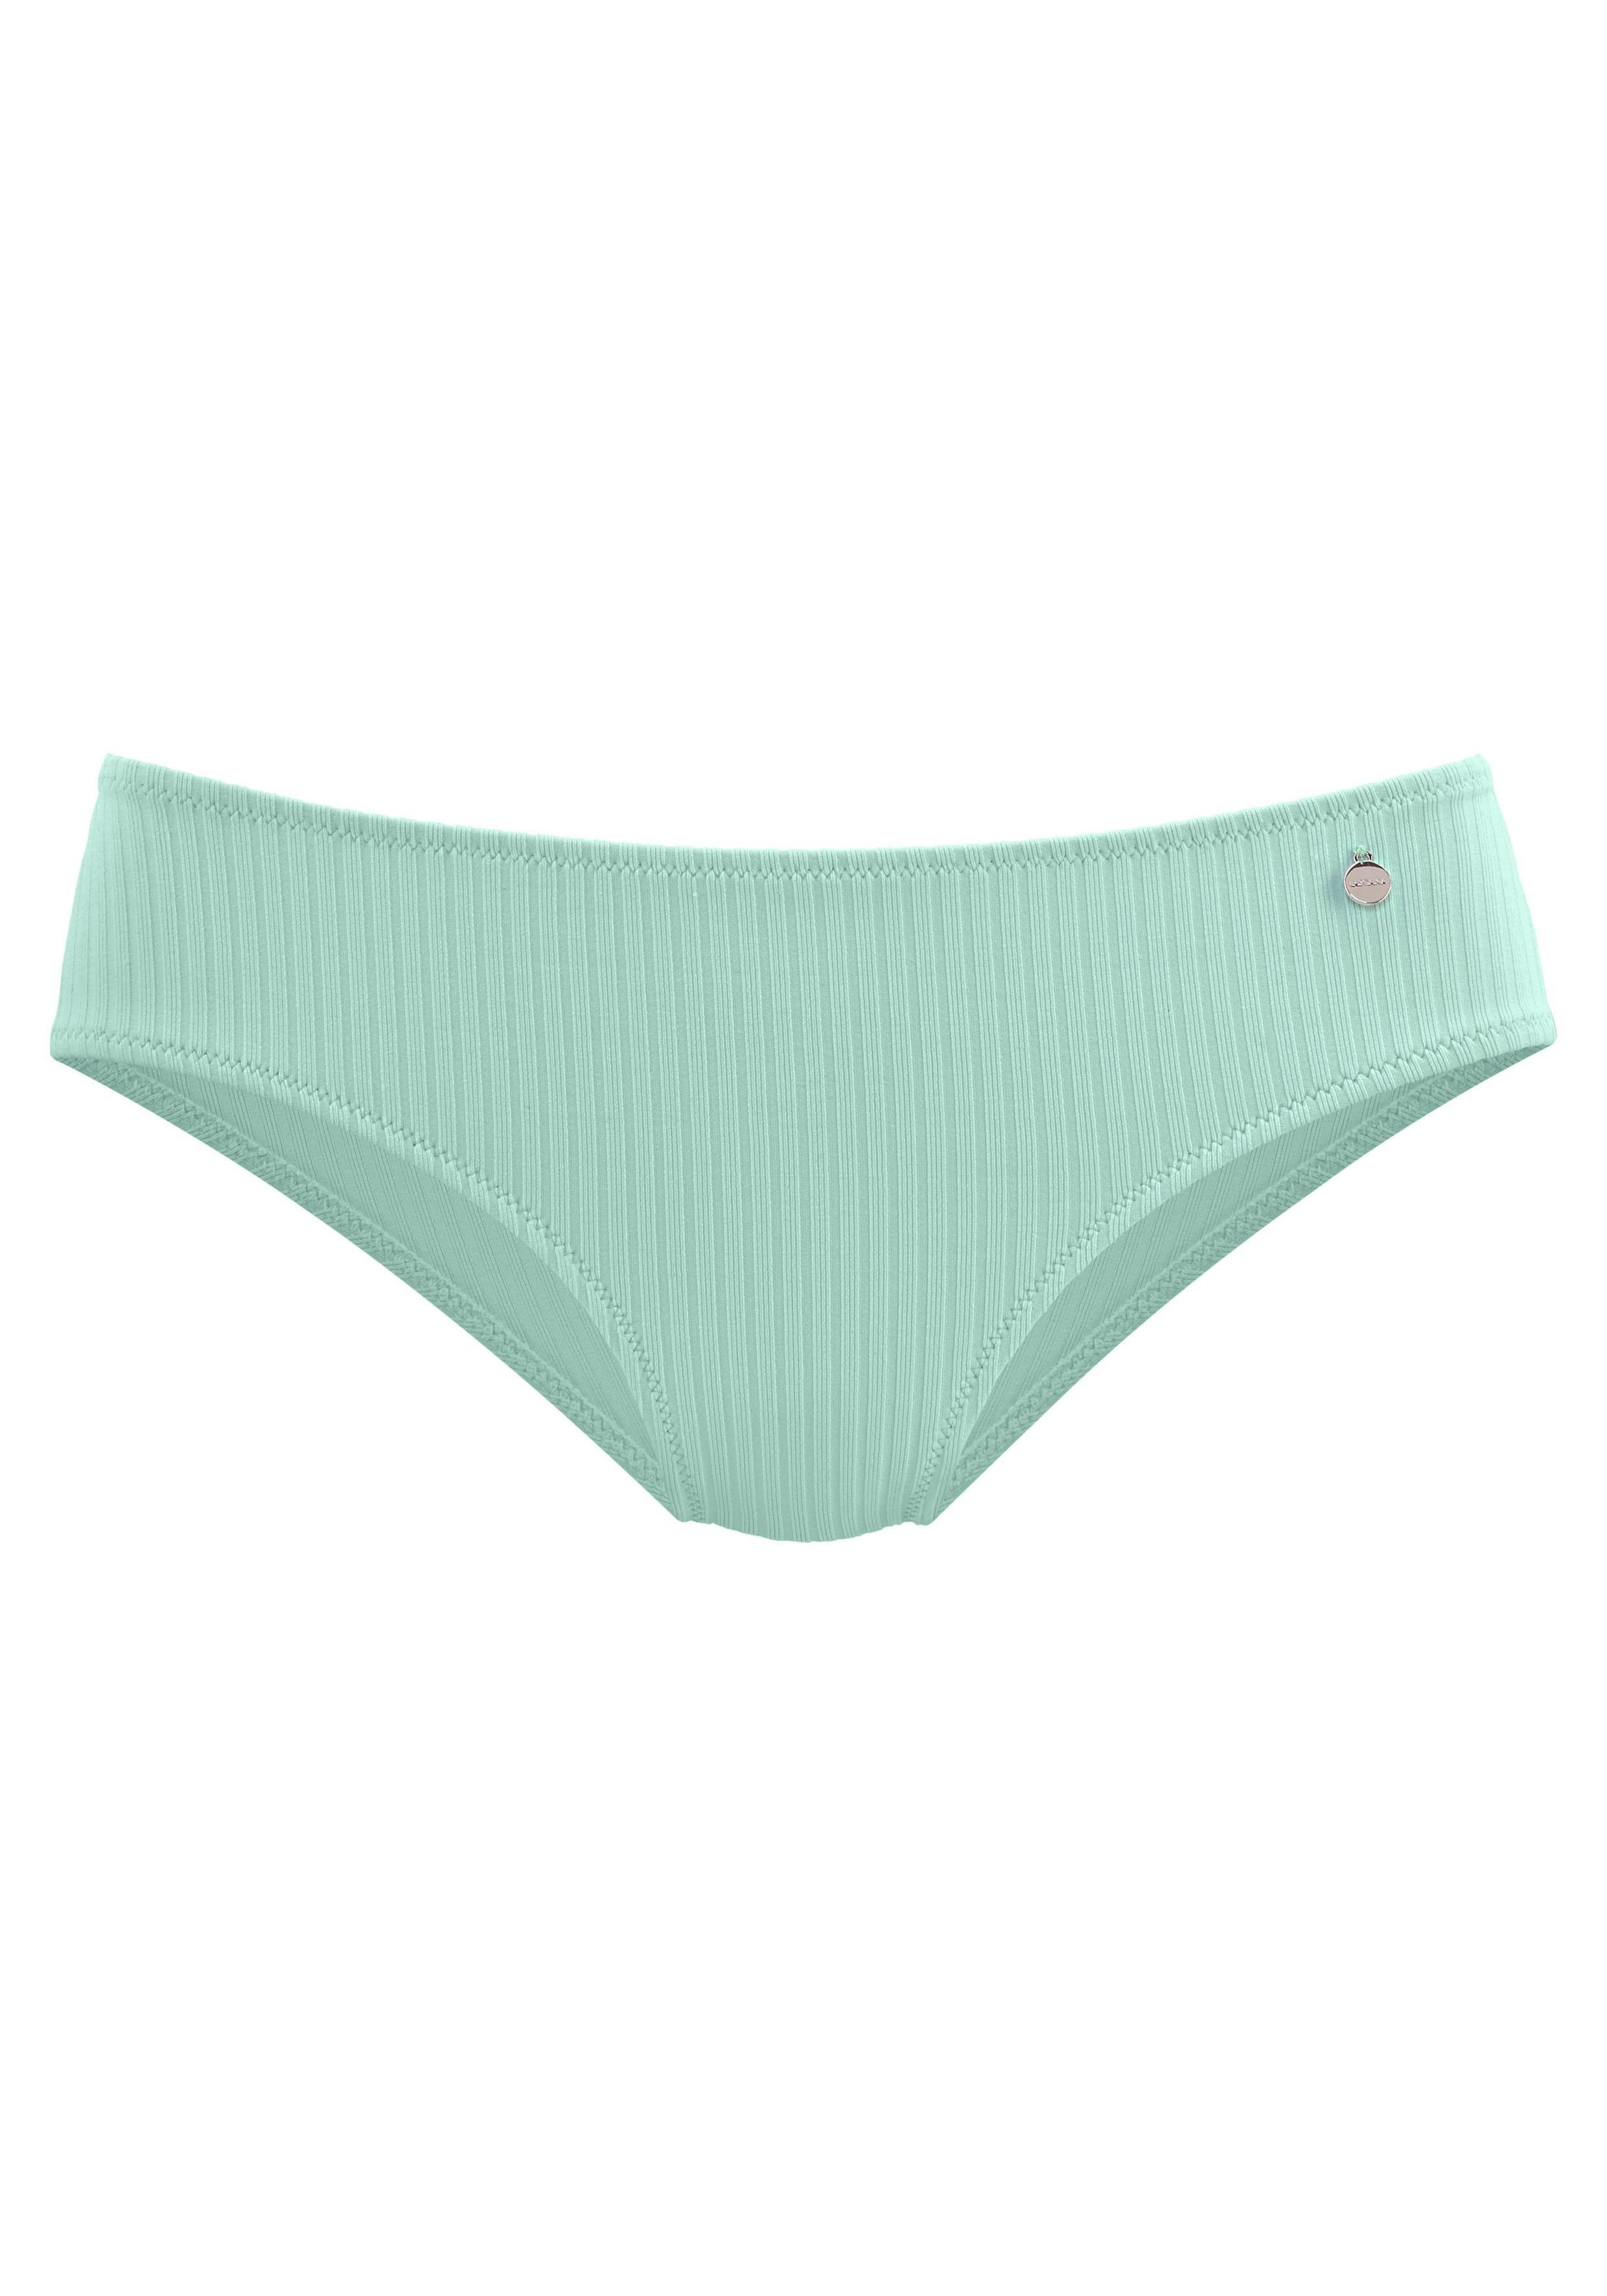 Lascana bikinibroekje Rippe in effen kleuren - verschillende betaalmethodes